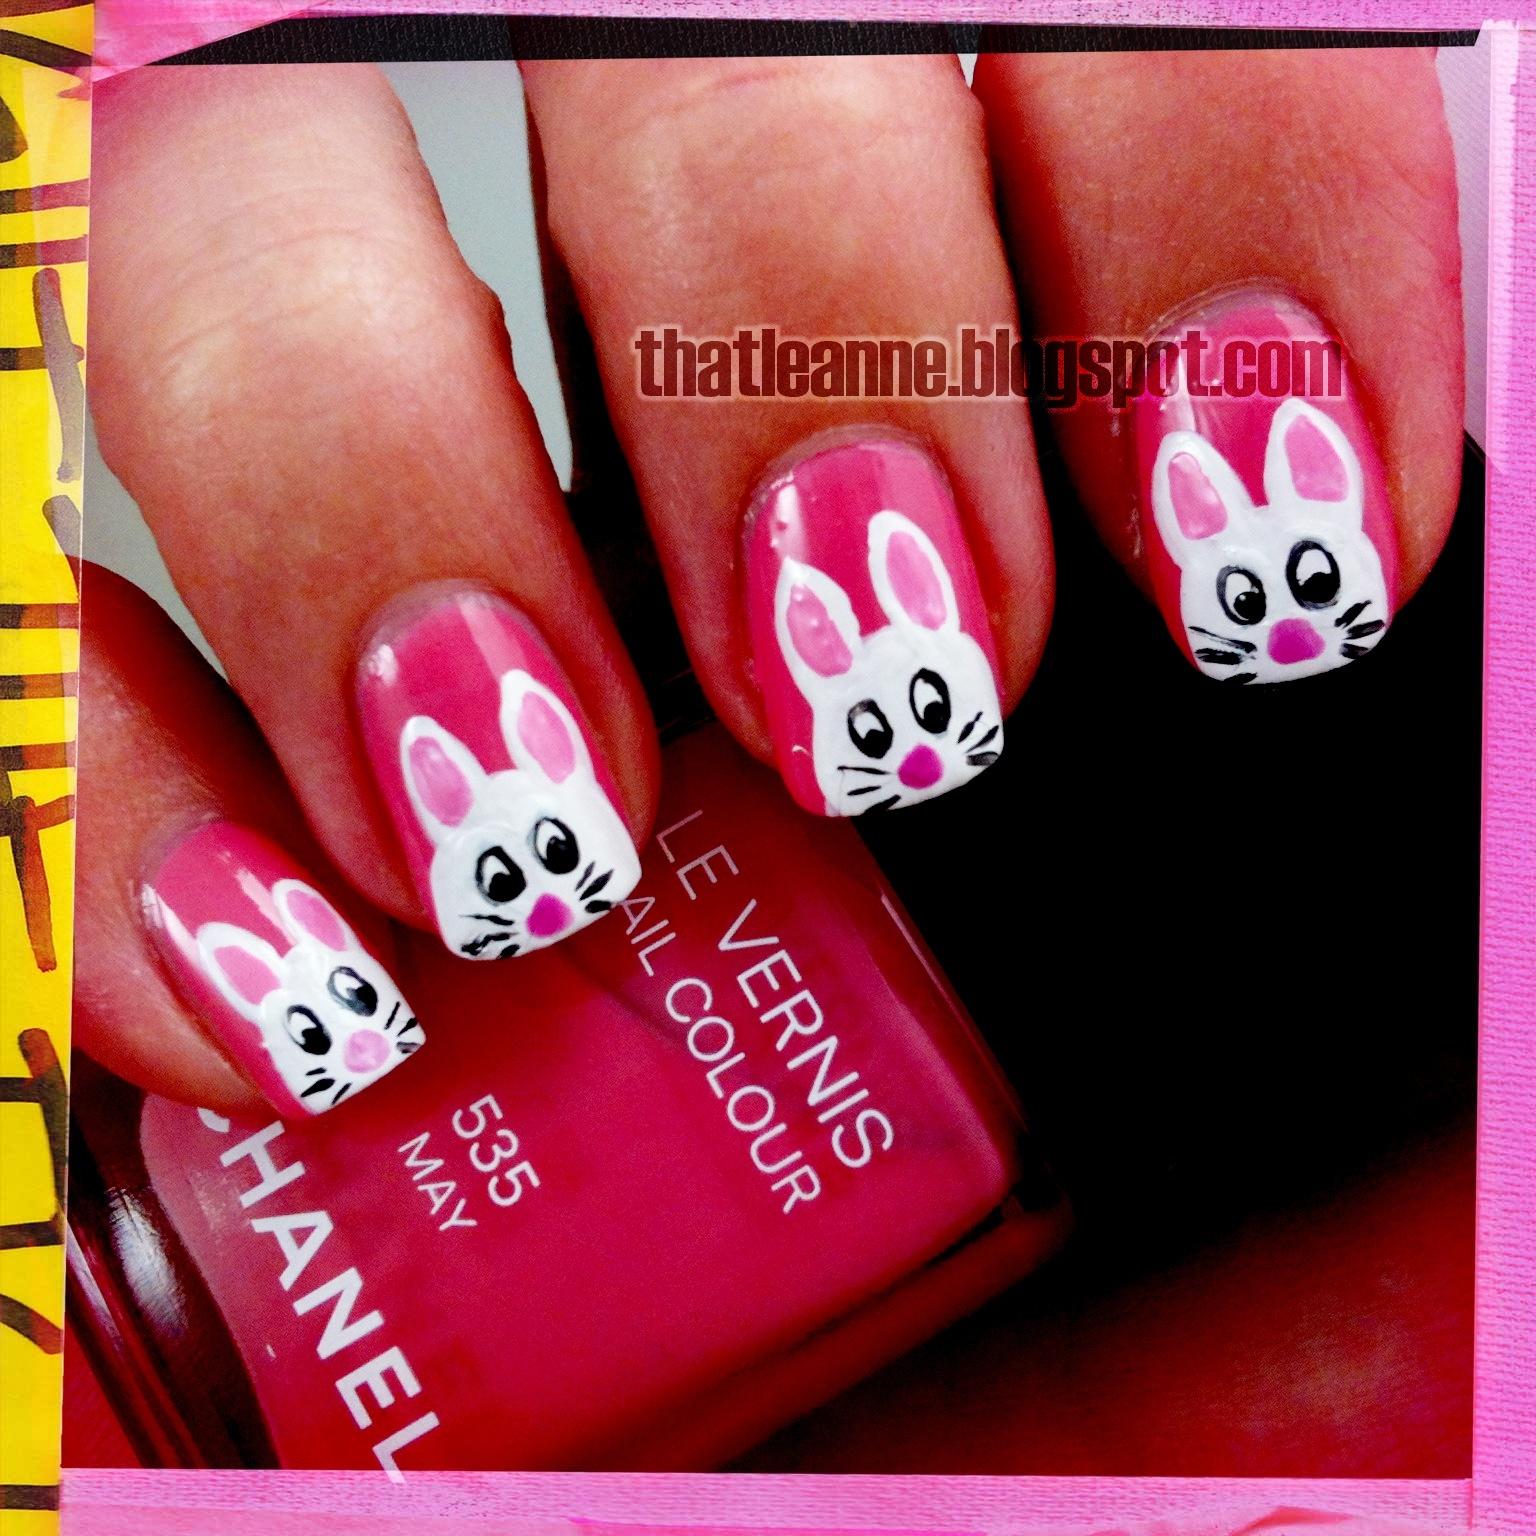 thatleanne: Easter Bunny Nail Art 2012!